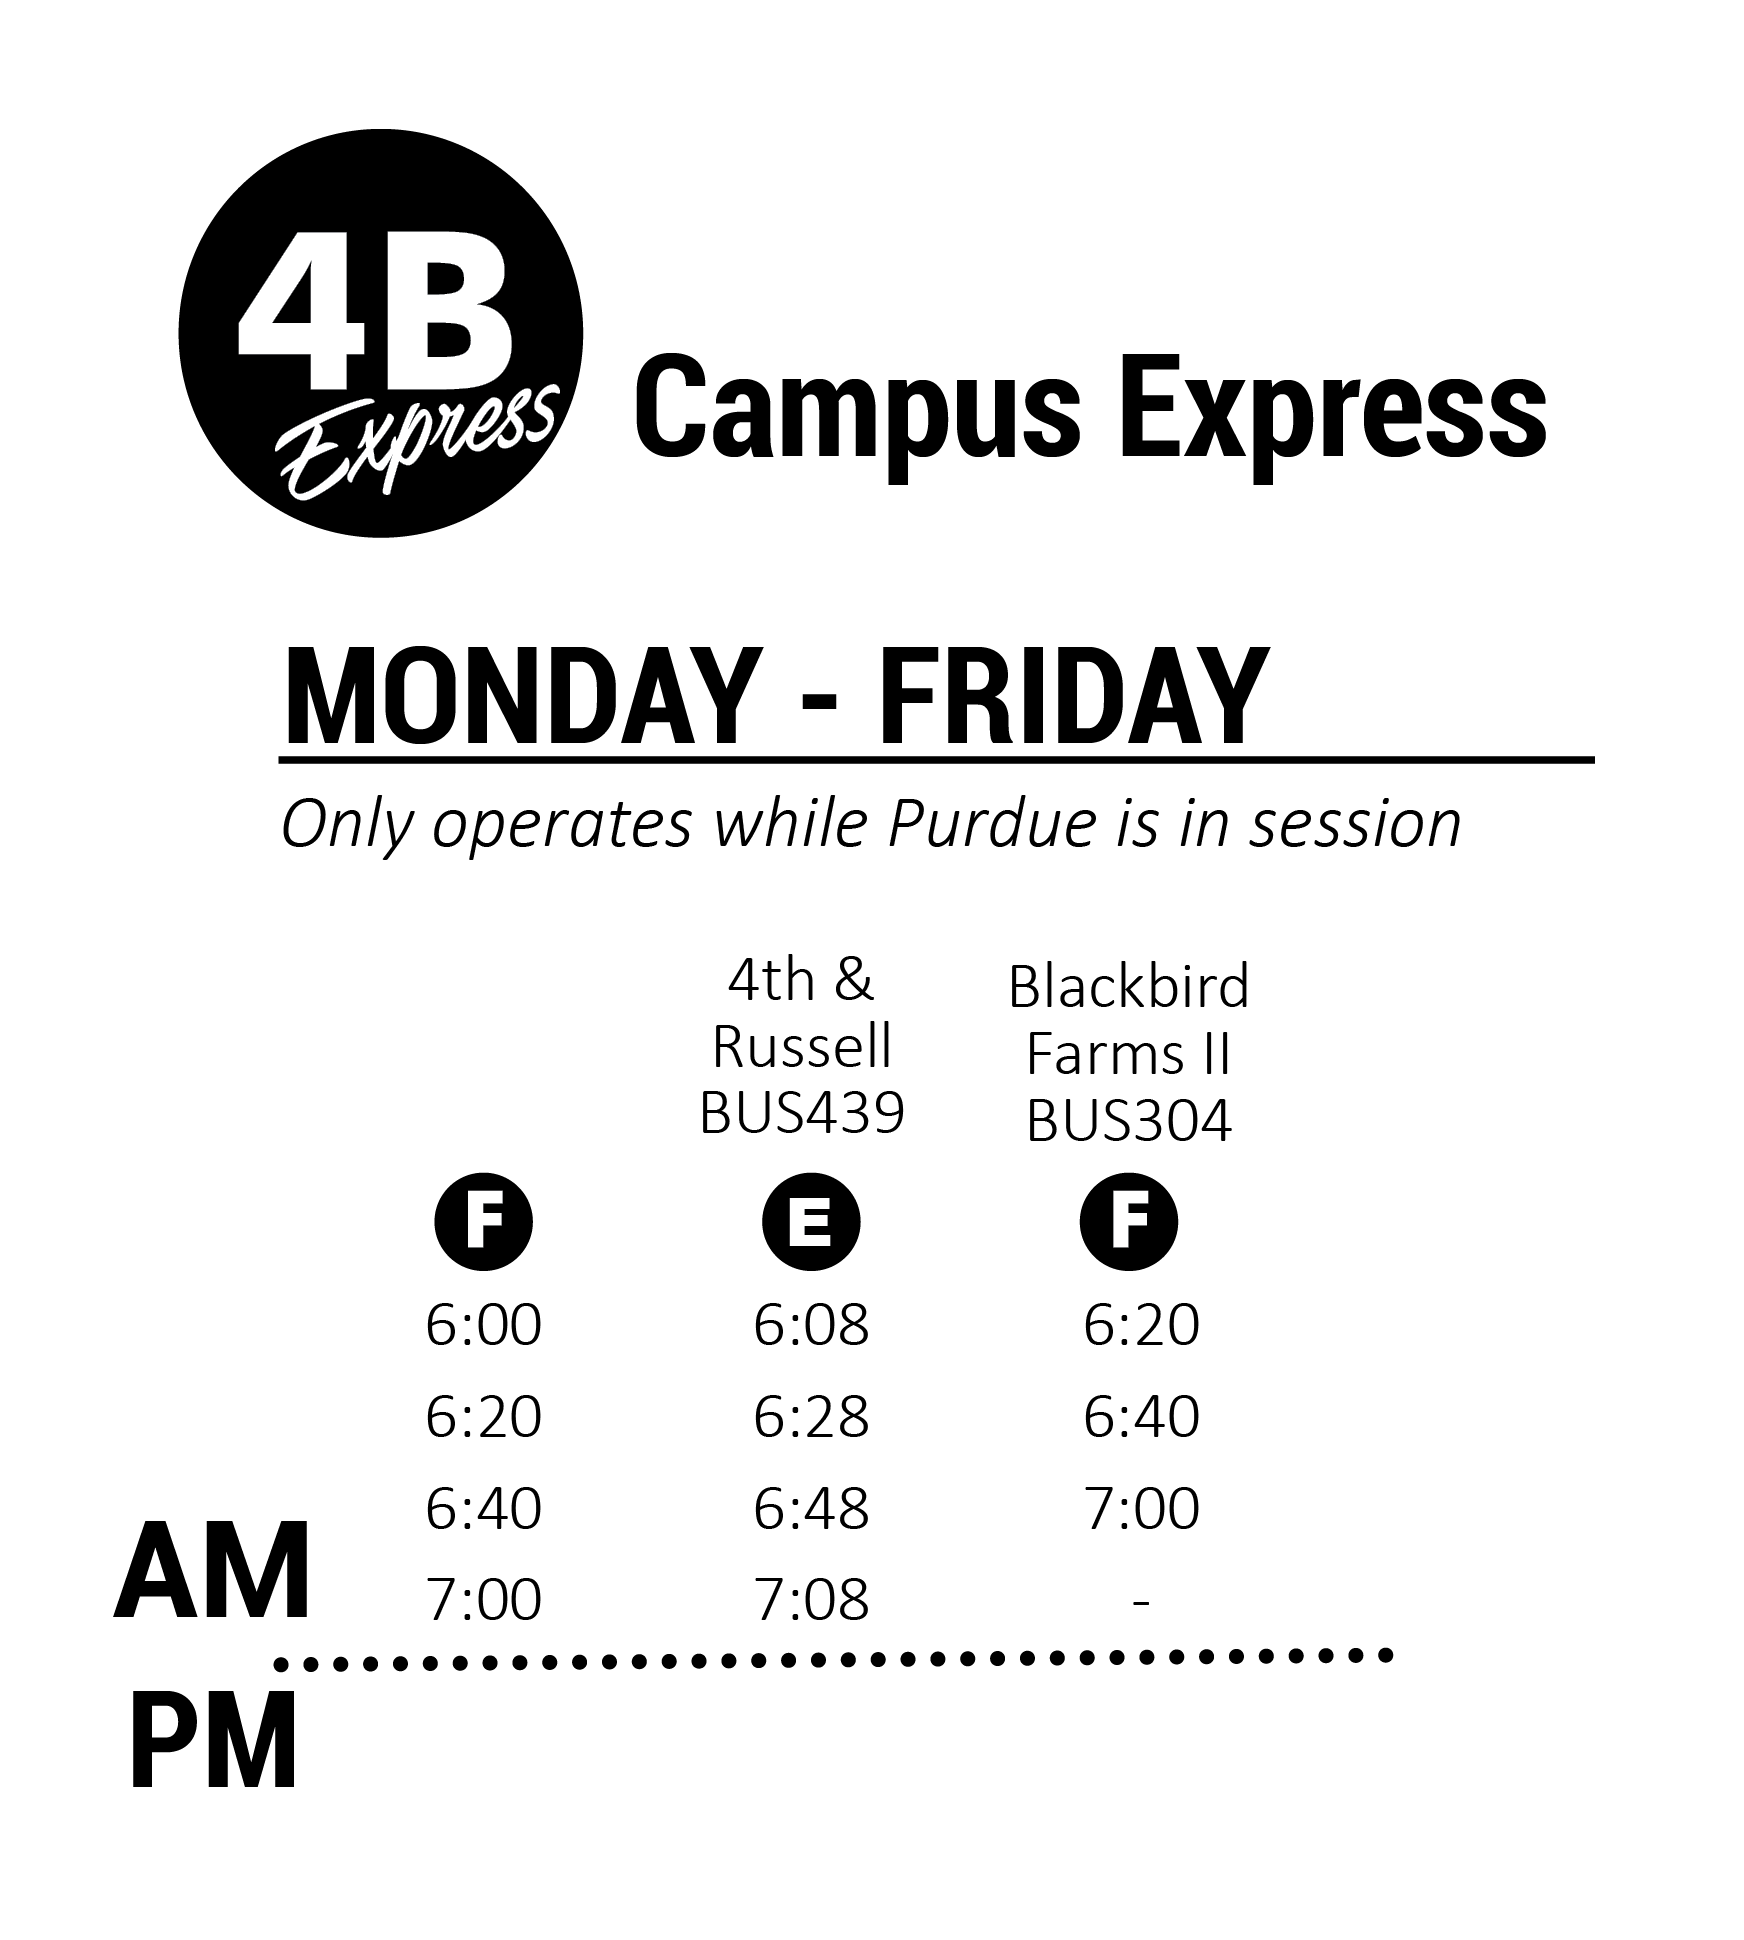 4B Express map